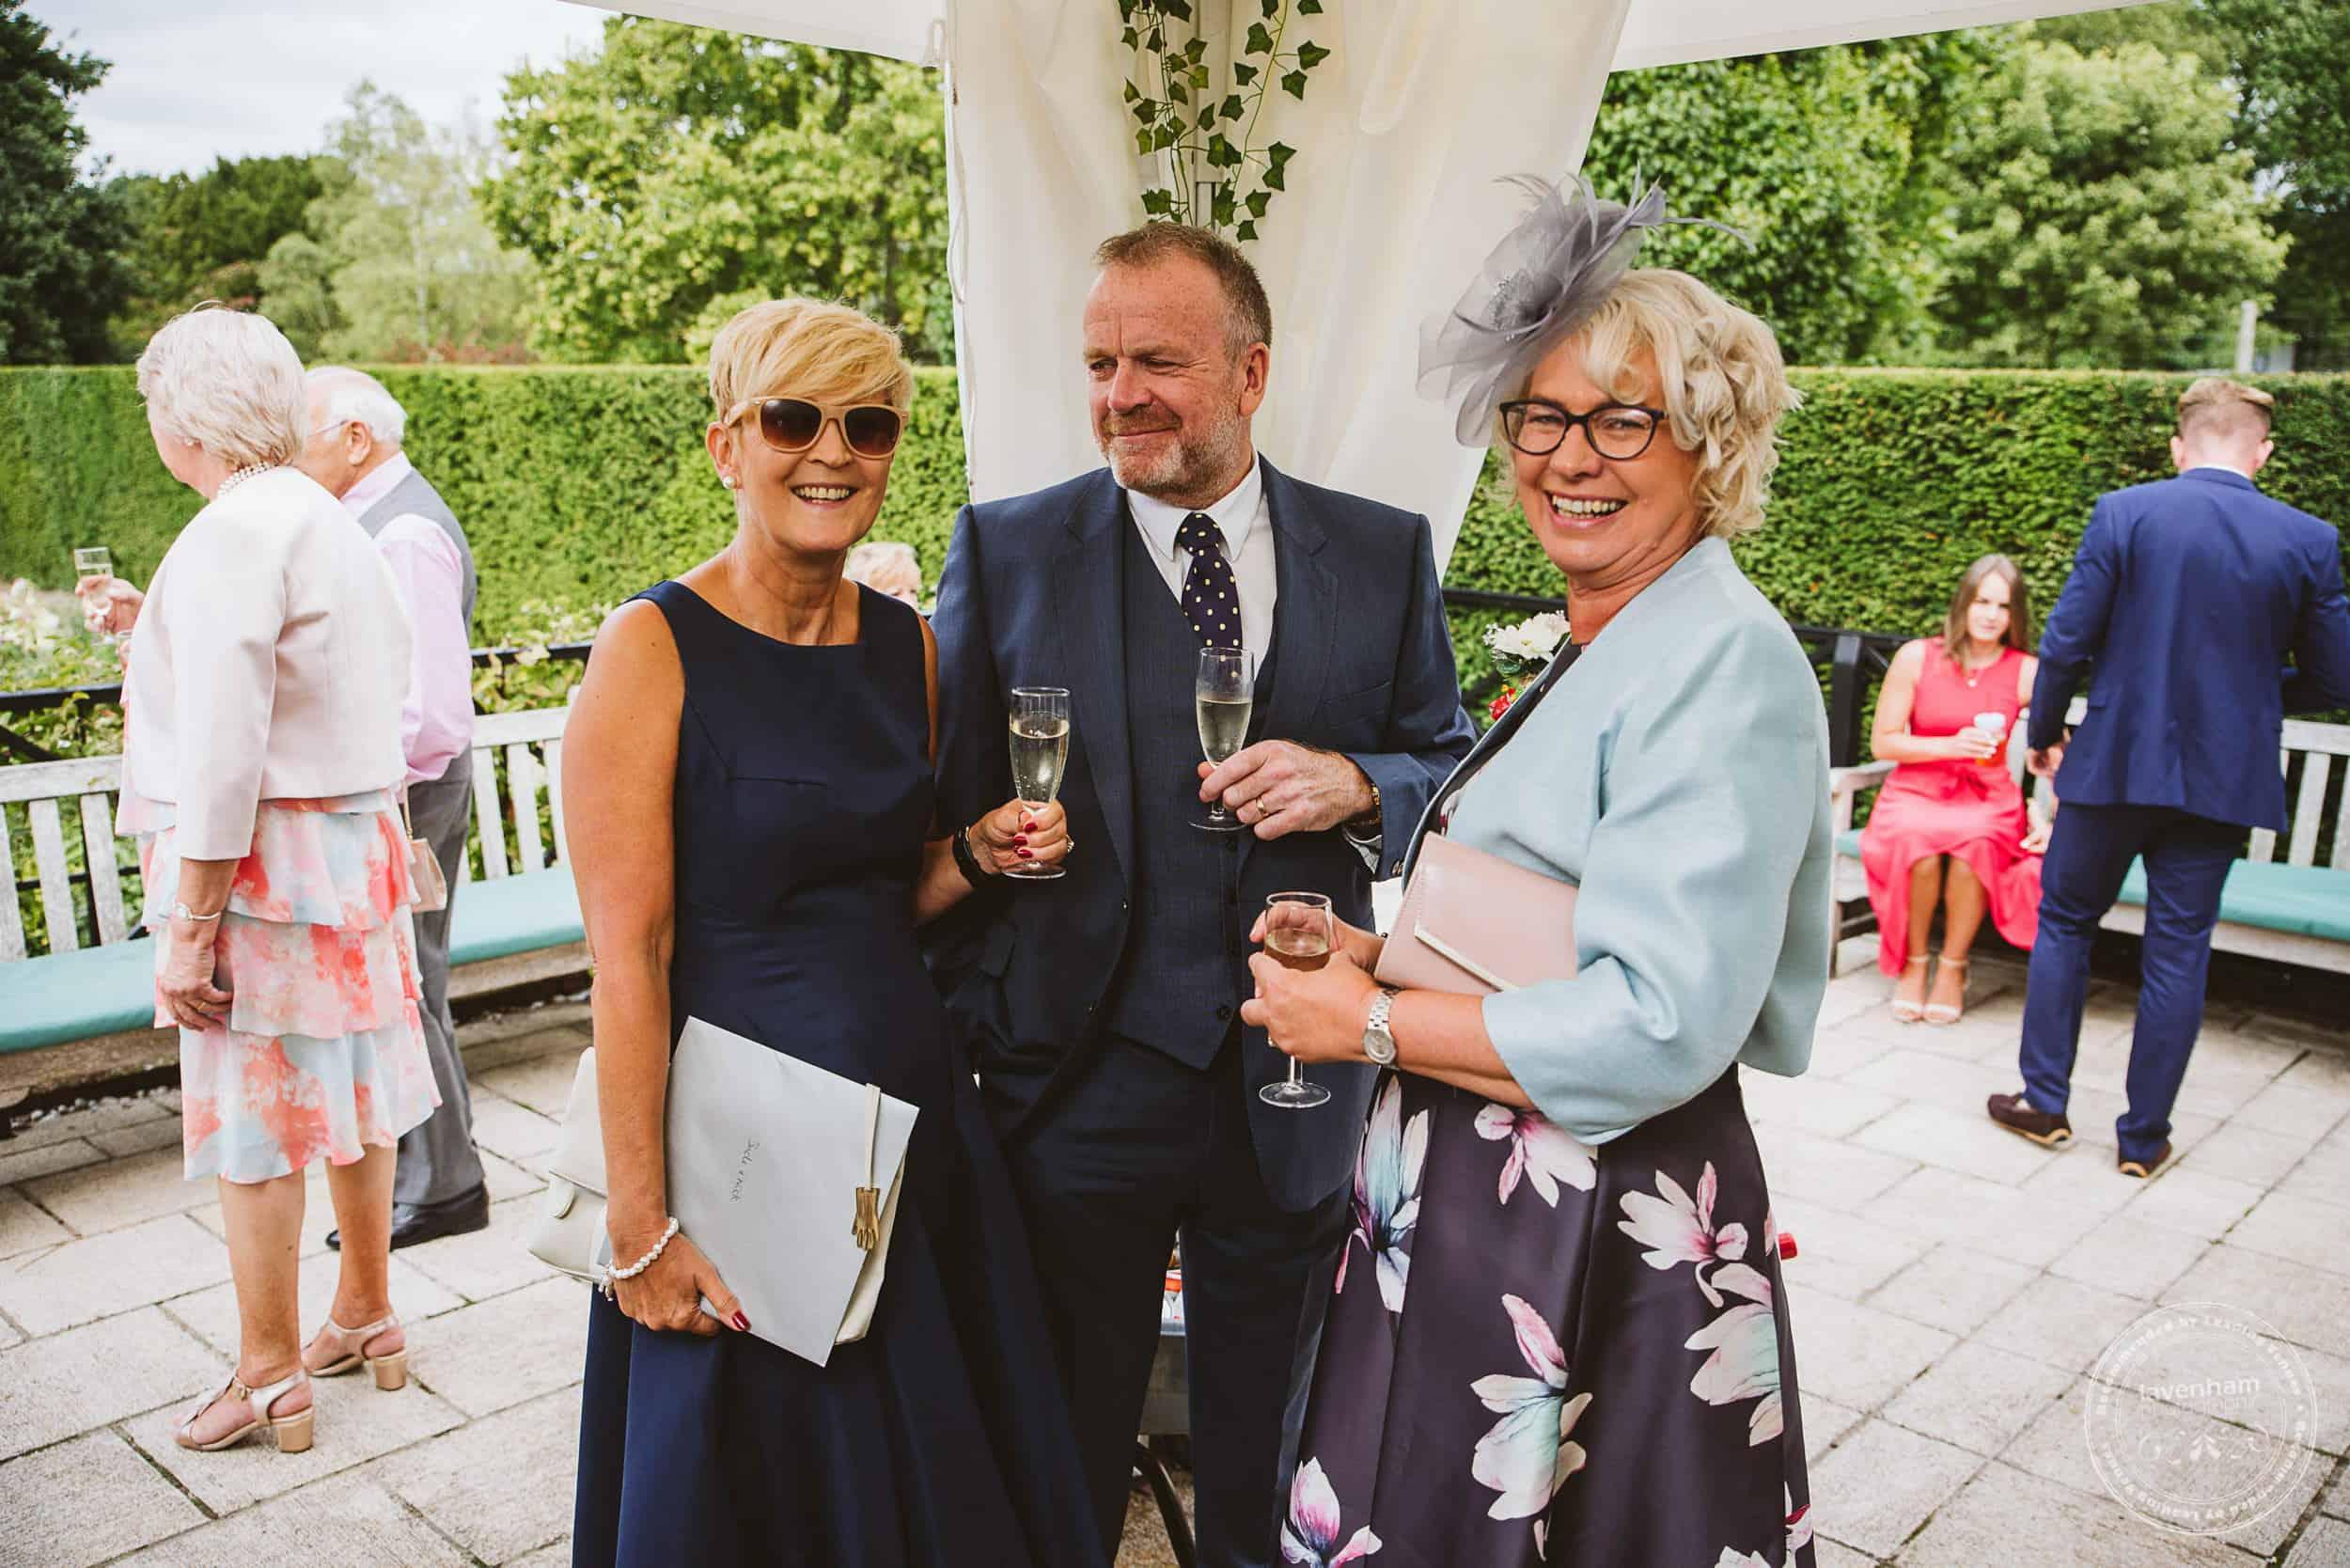 180818 Marks Hall Wedding Photography Lavenham Photographic 080